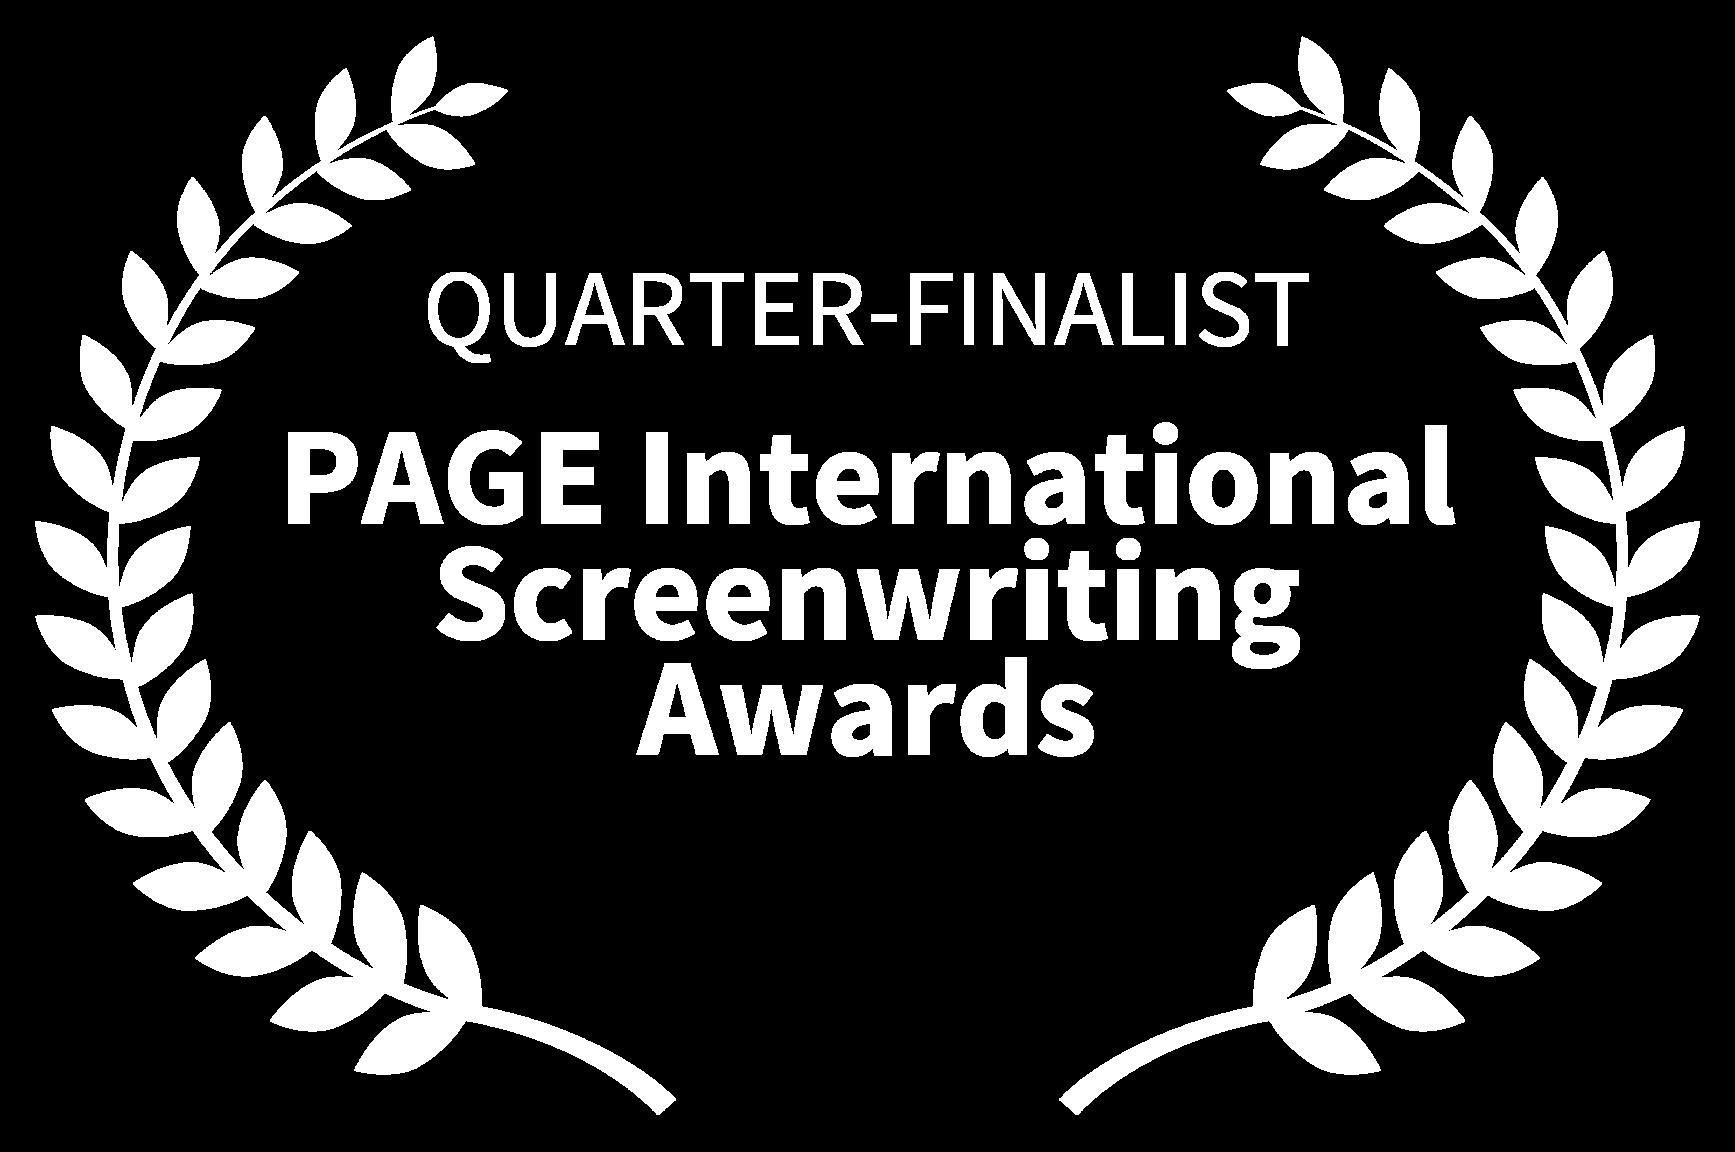 QUARTER-FINALIST - PAGE International Screenwriting Awards